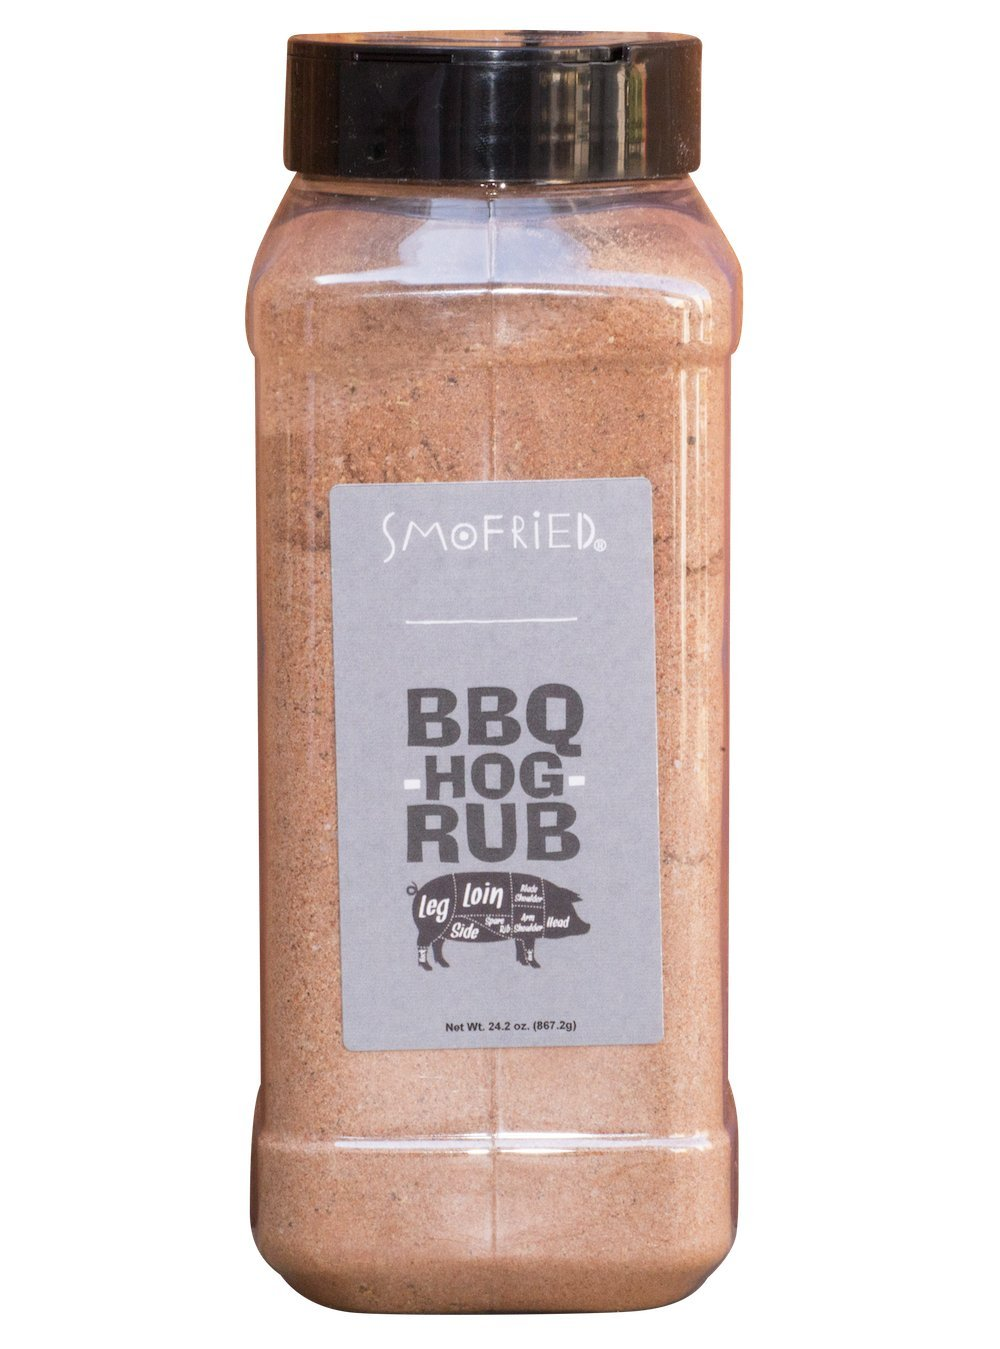 Smofried BBQ Hog Rub - 24.2 Ounces by Smofried (Image #1)